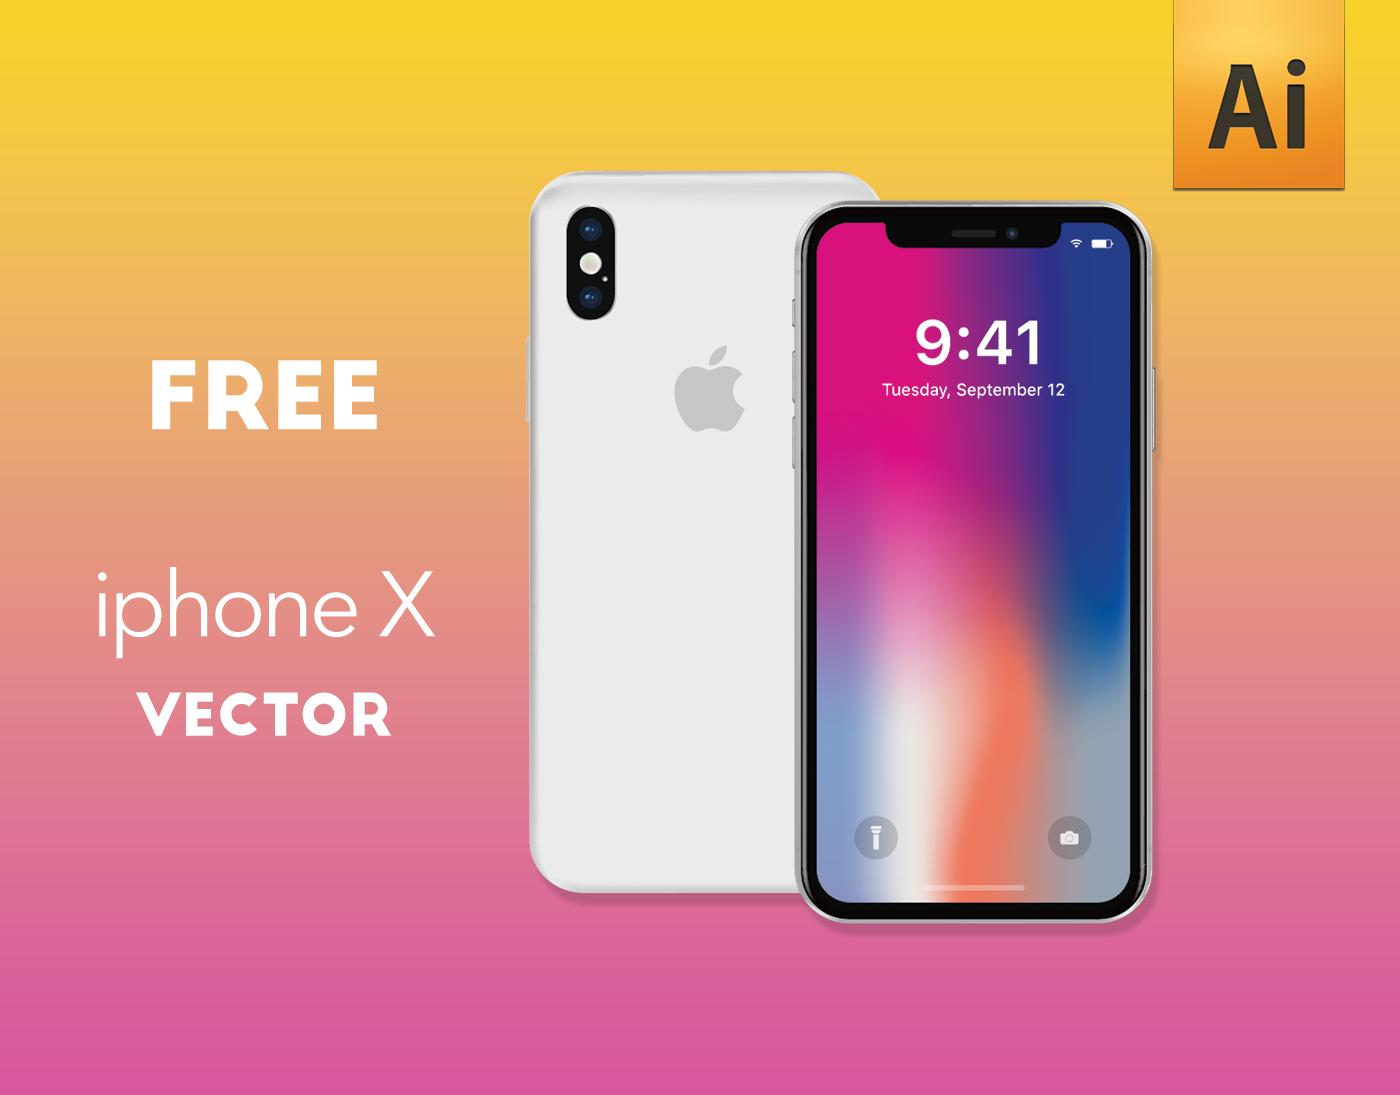 1400x1095 Iphone X Vector Free (Ai) On Behance